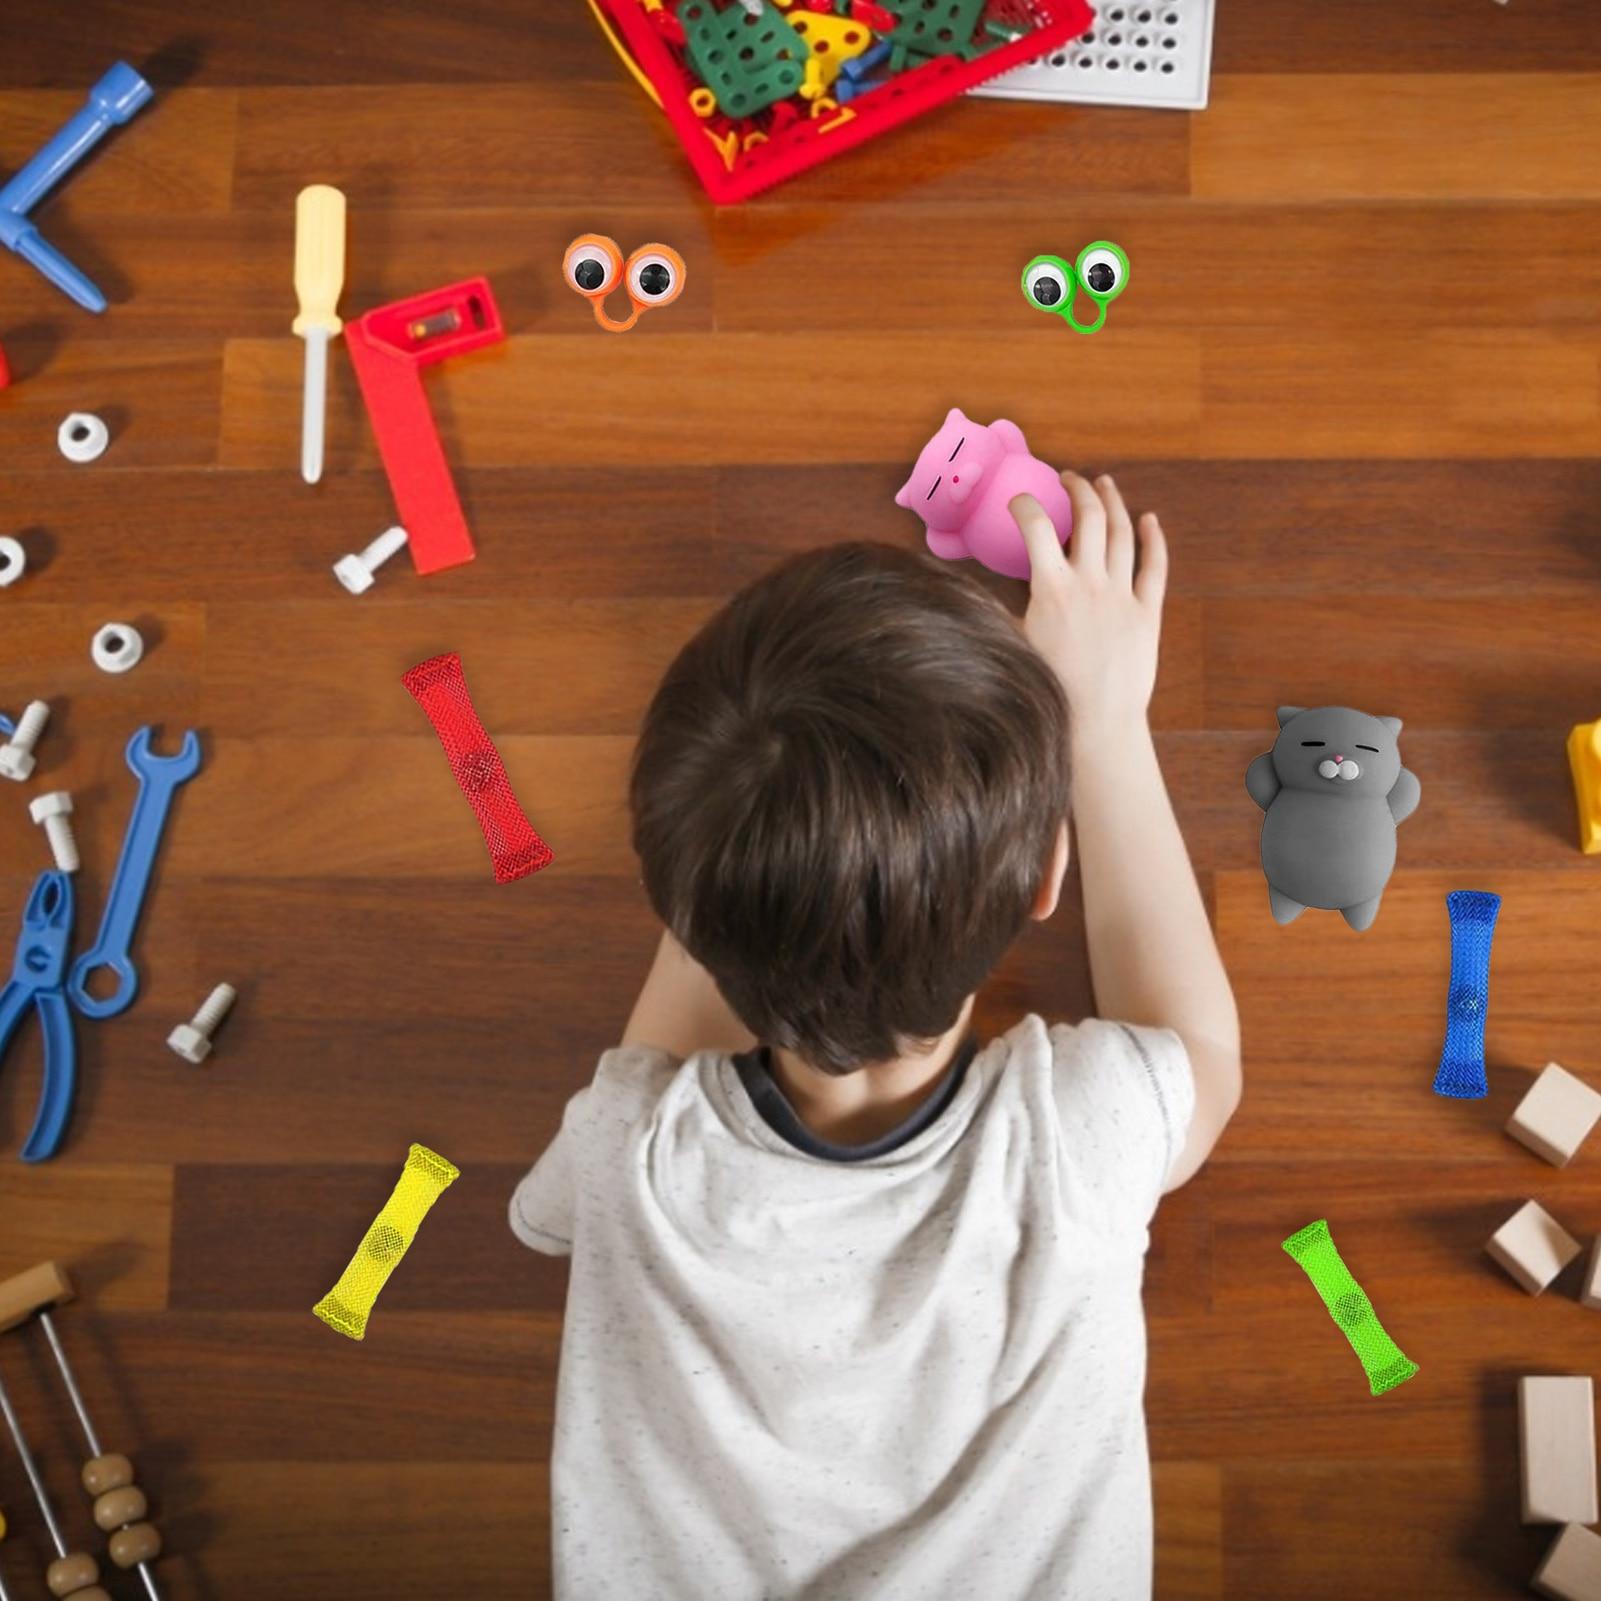 21PCS Pack Fidget Sensory Toy Set Stress Relief Toys Autism Anxiety Relief Stress Pop Bubble Fidget Toys For Kids Adults enlarge